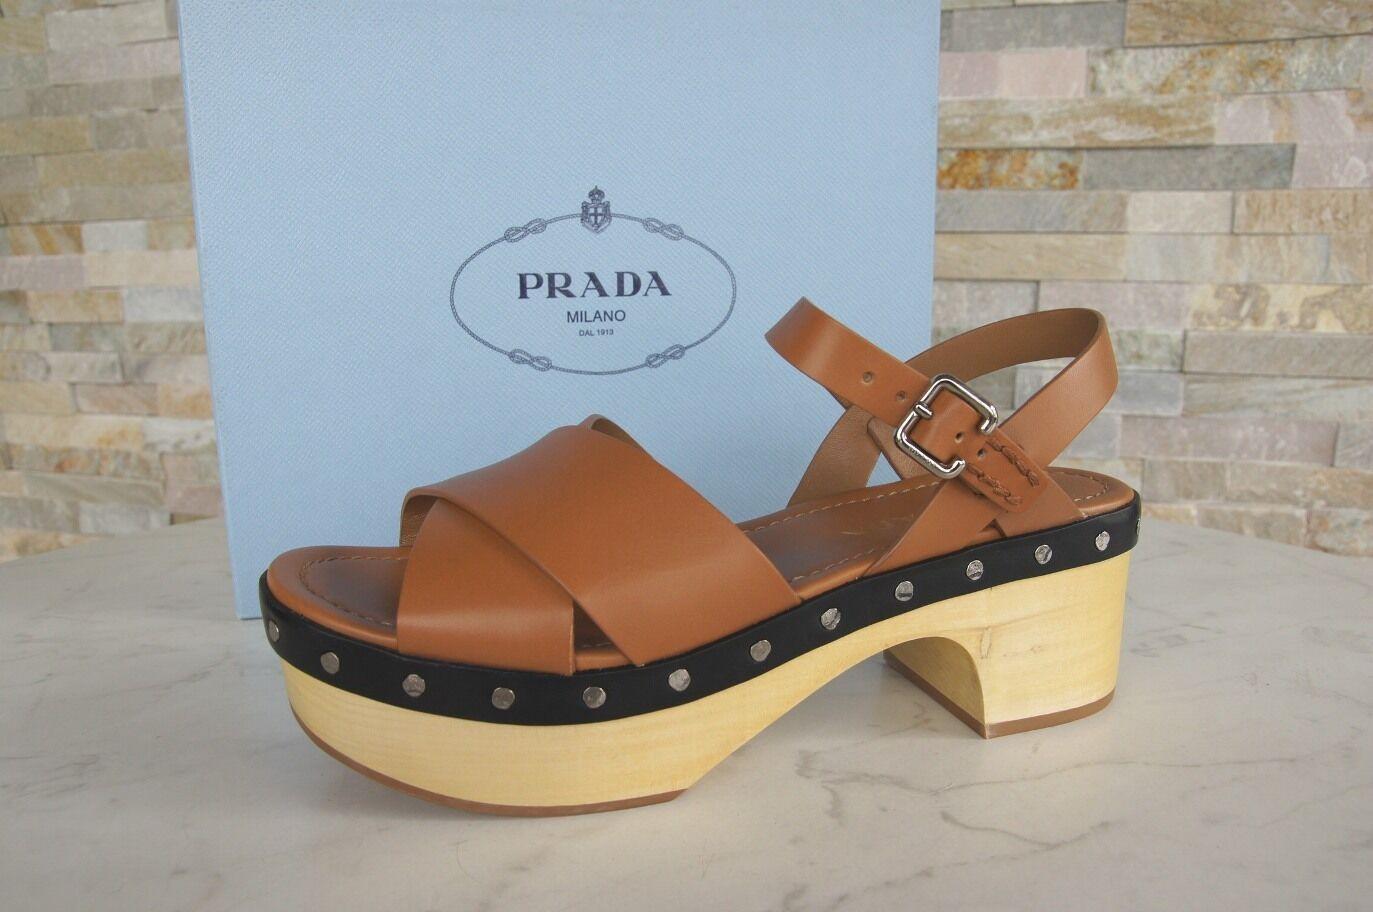 Prada madera plataforma sandalias zapatos Clogs naturaleza marrón nuevo PVP